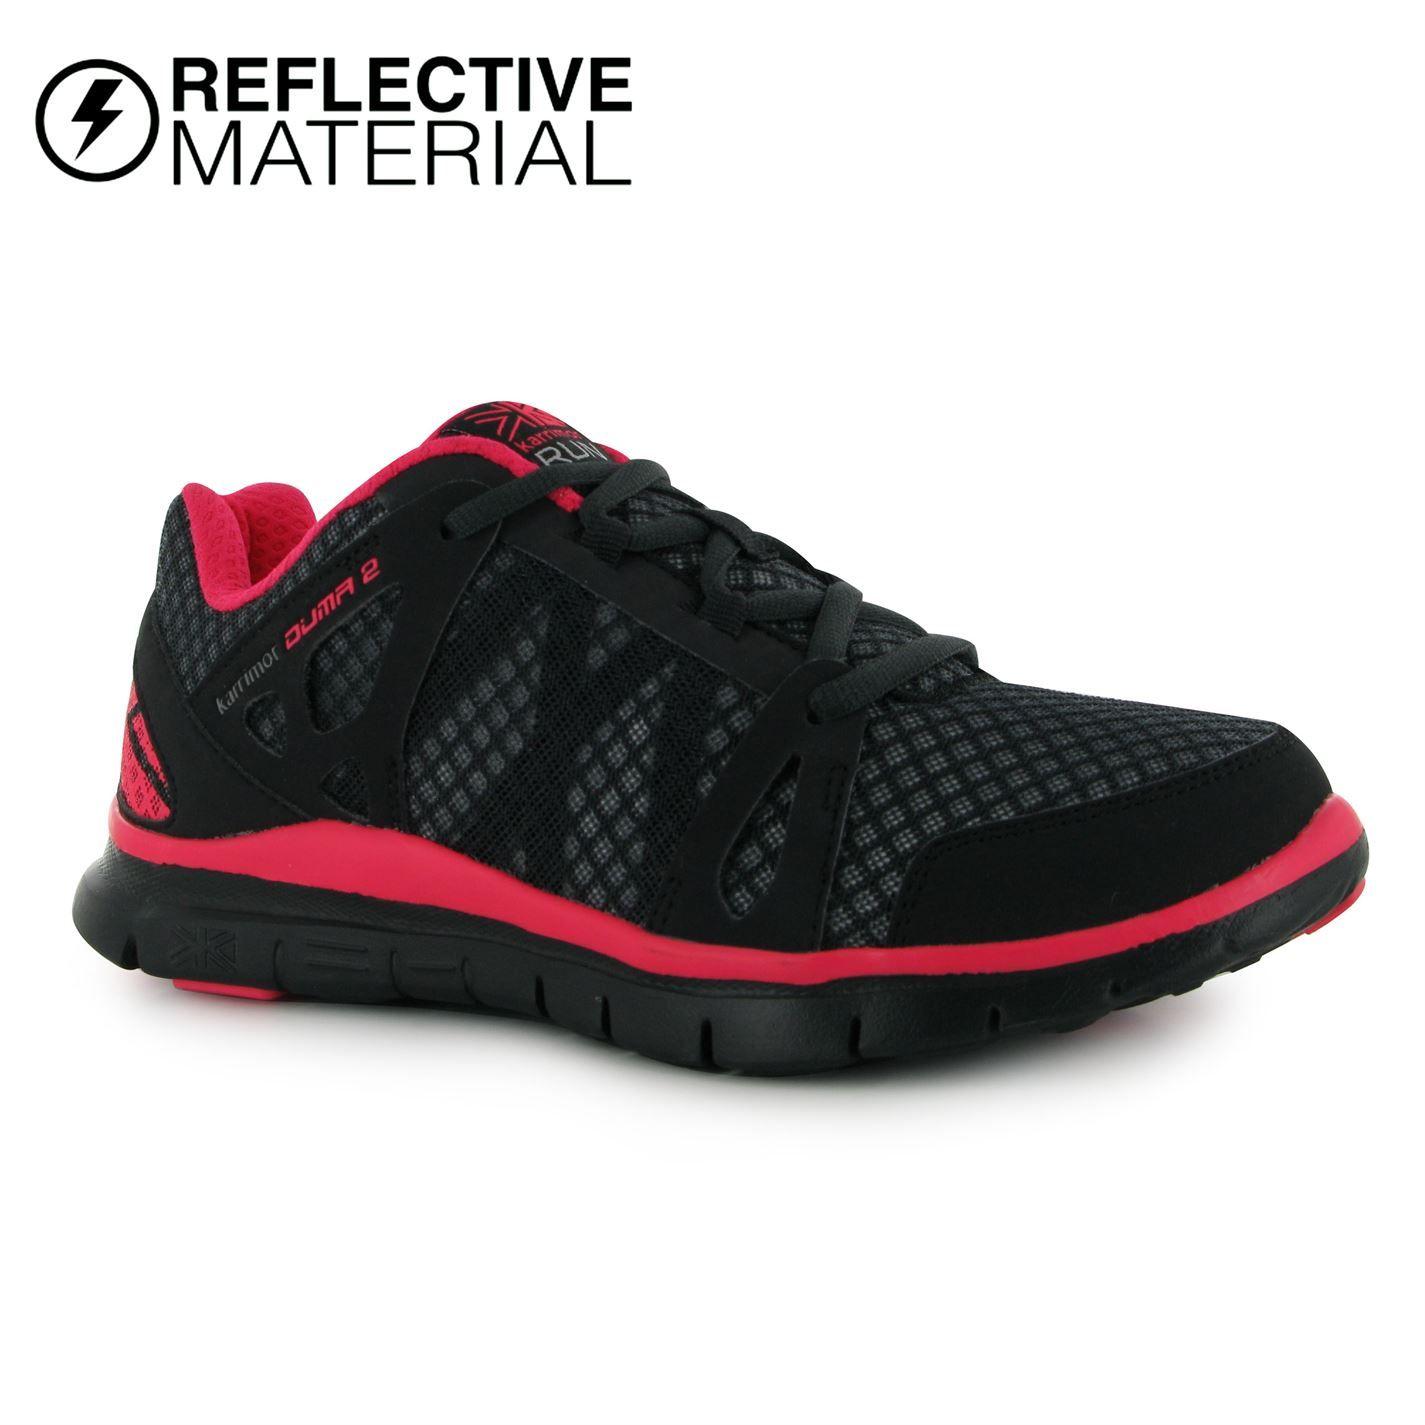 Karrimor Karrimor Duma 2 Ladies Running Shoes Ladies